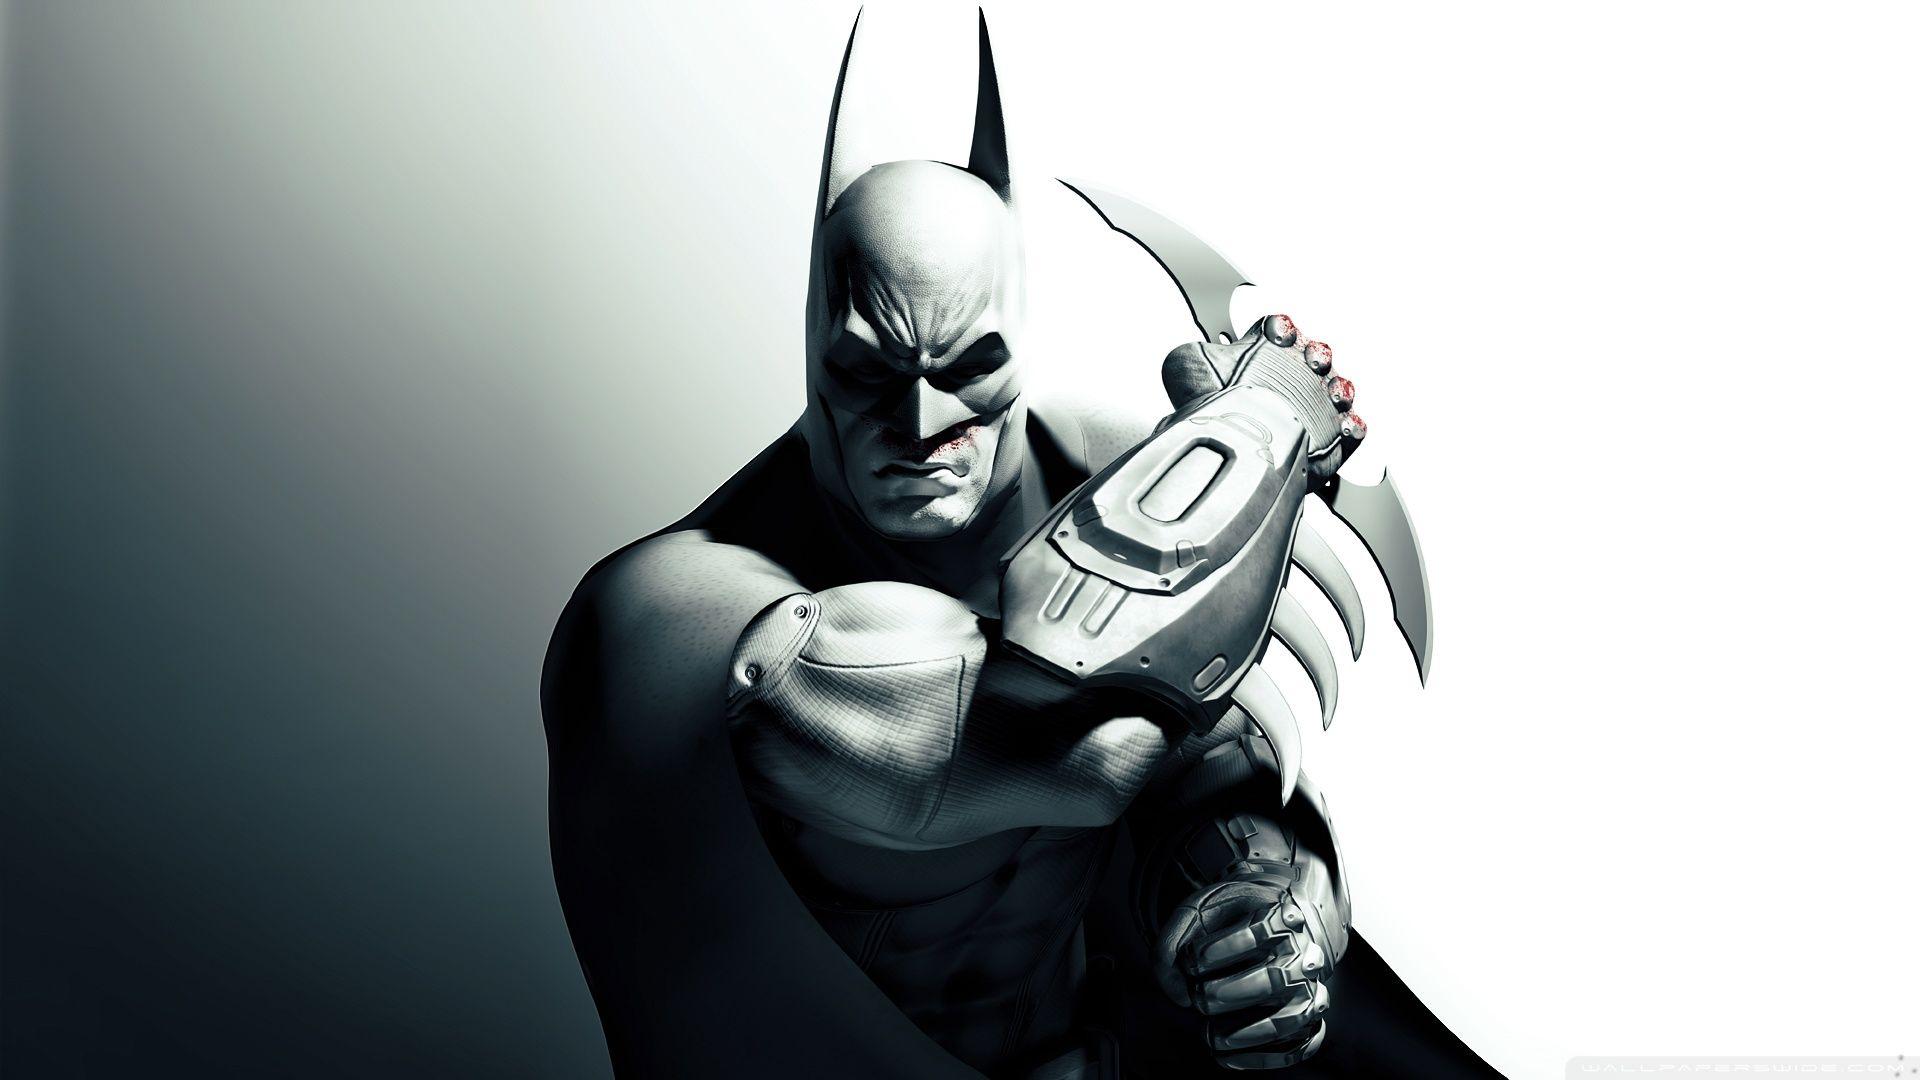 cool batman wallpapers - sf wallpaper